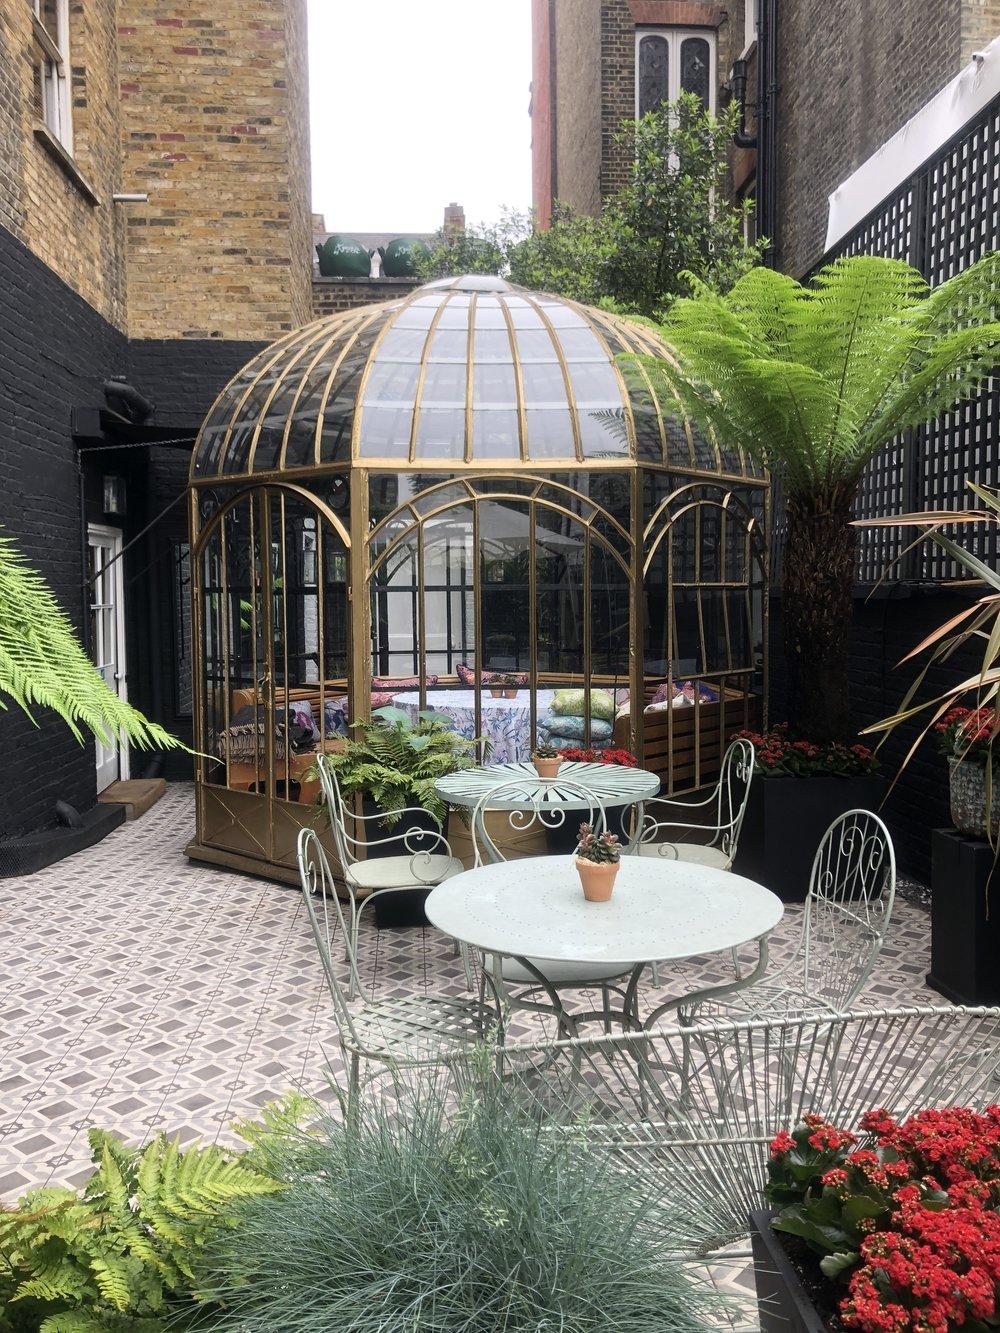 blakes hotel london courtyard.JPG